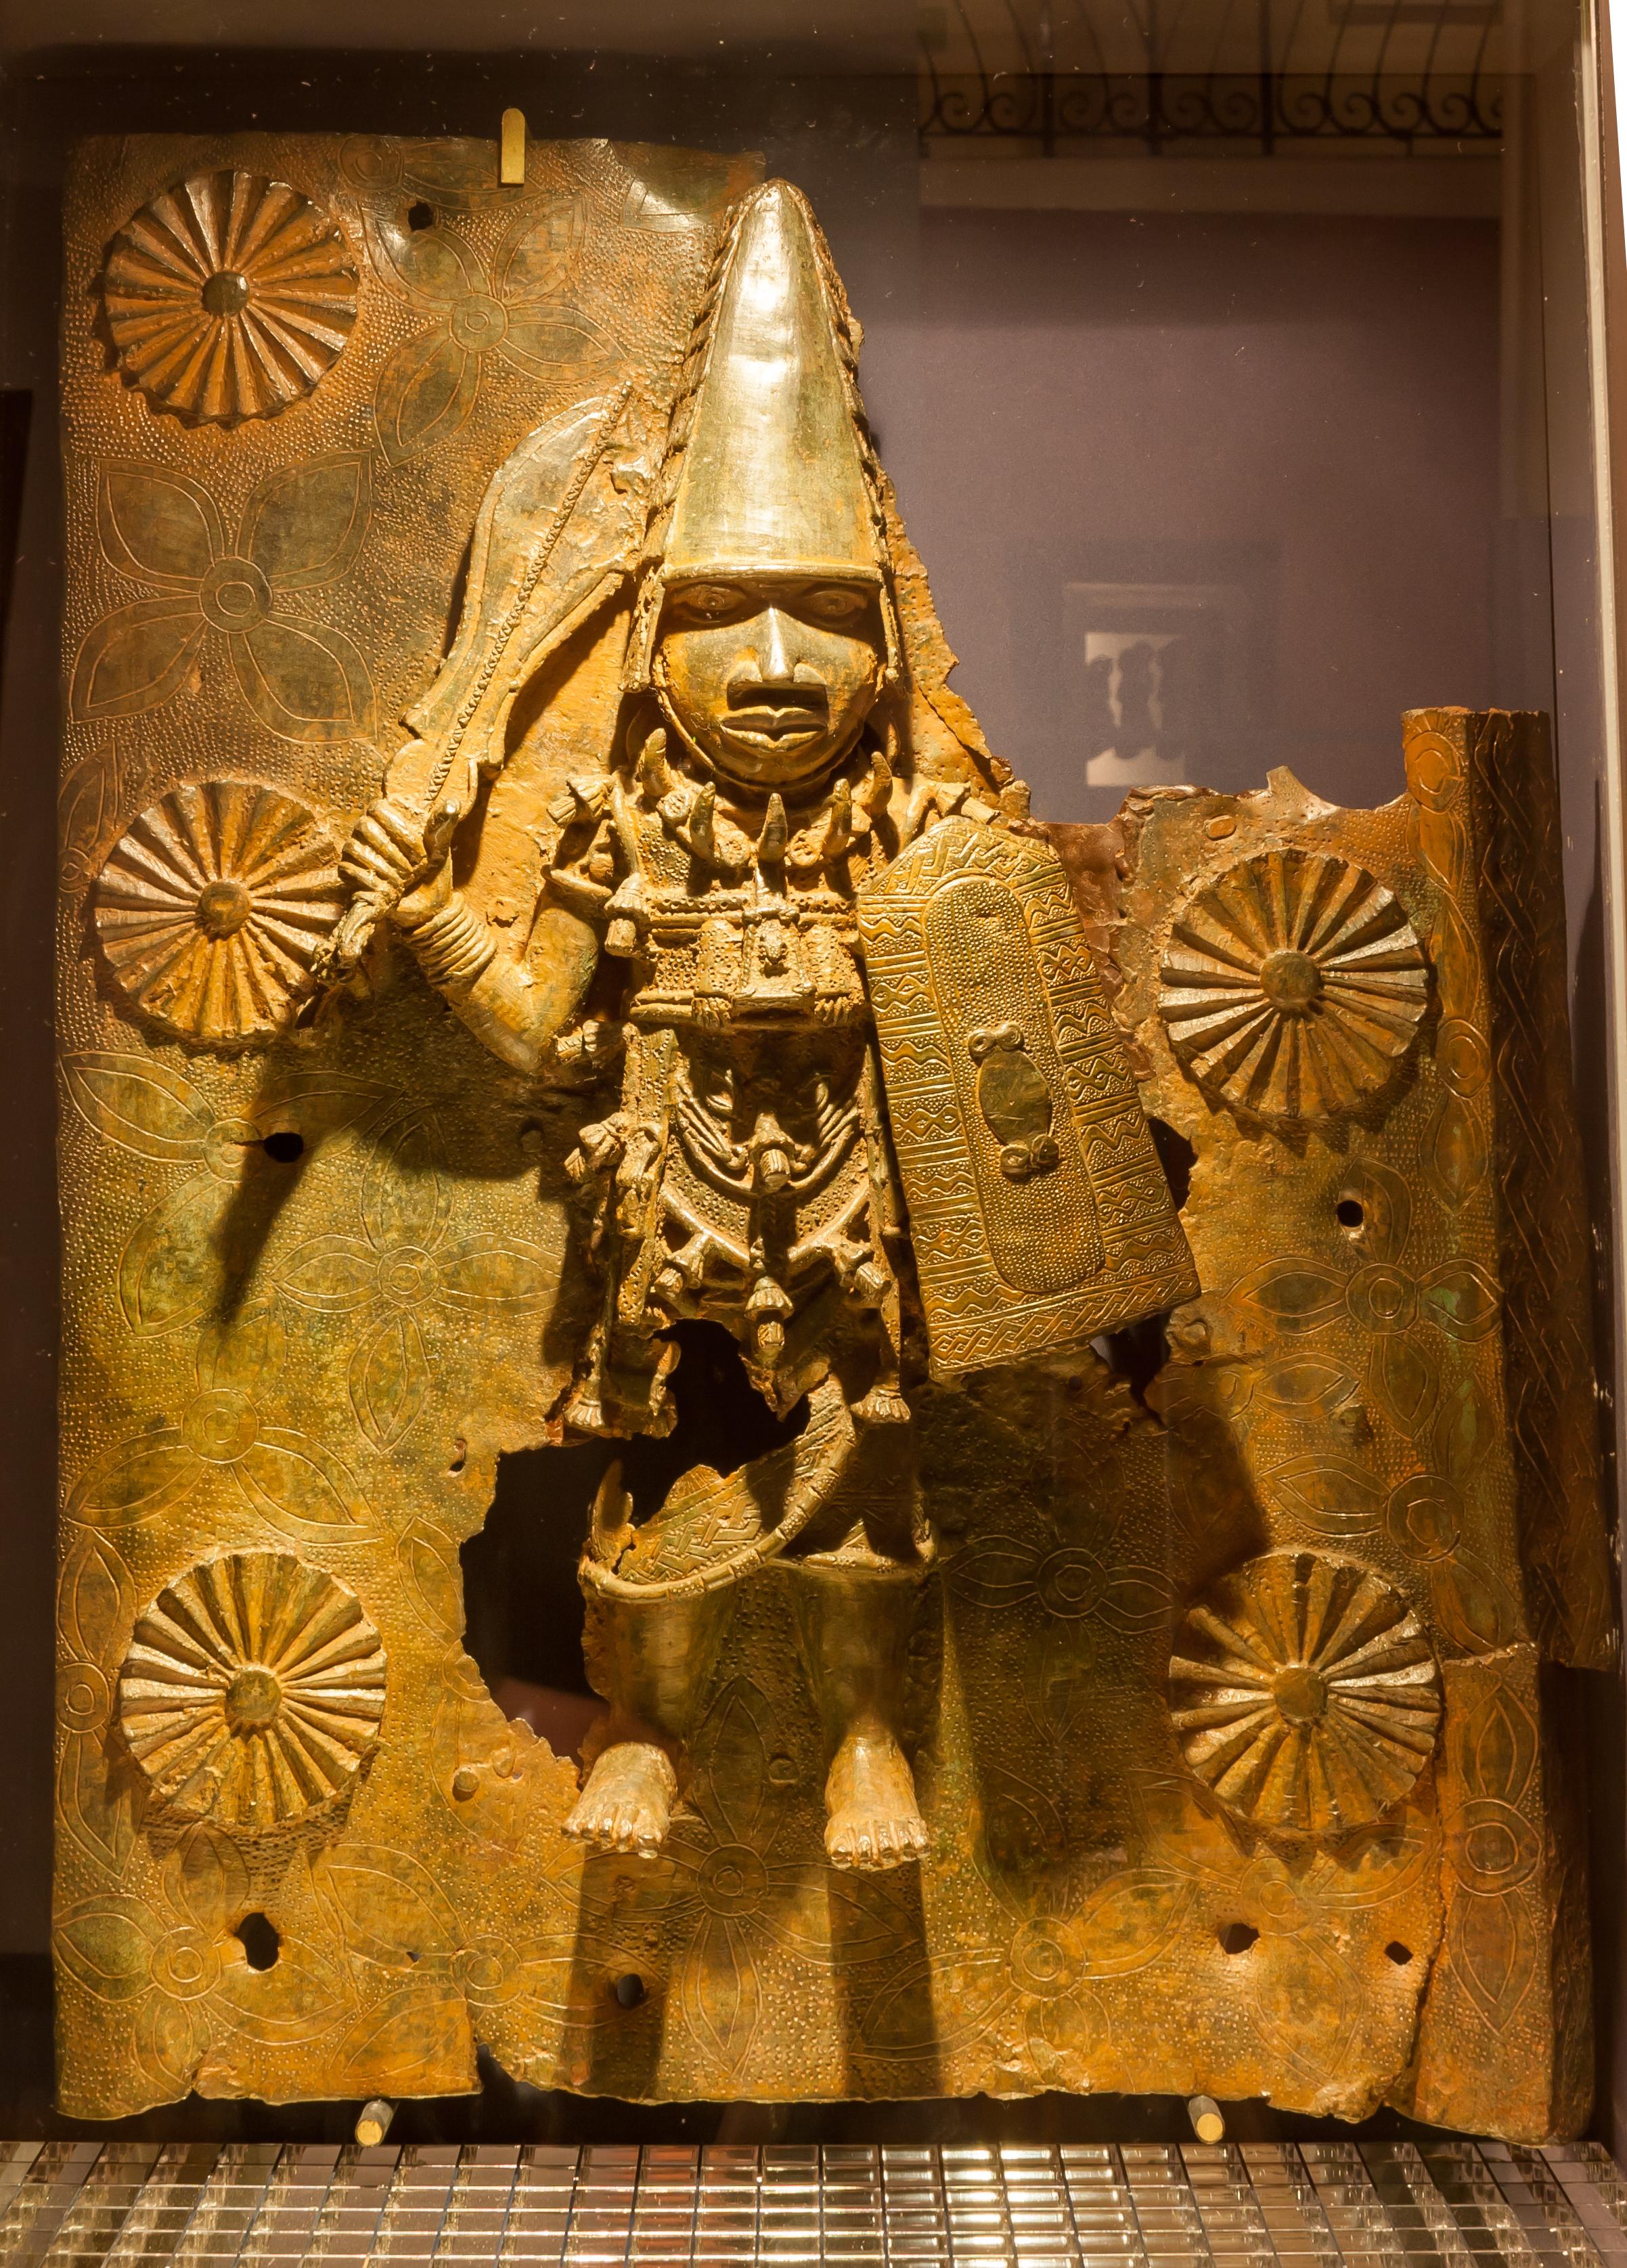 File:Benin Bronzes, Horniman Museum.jpg - Wikimedia Commons